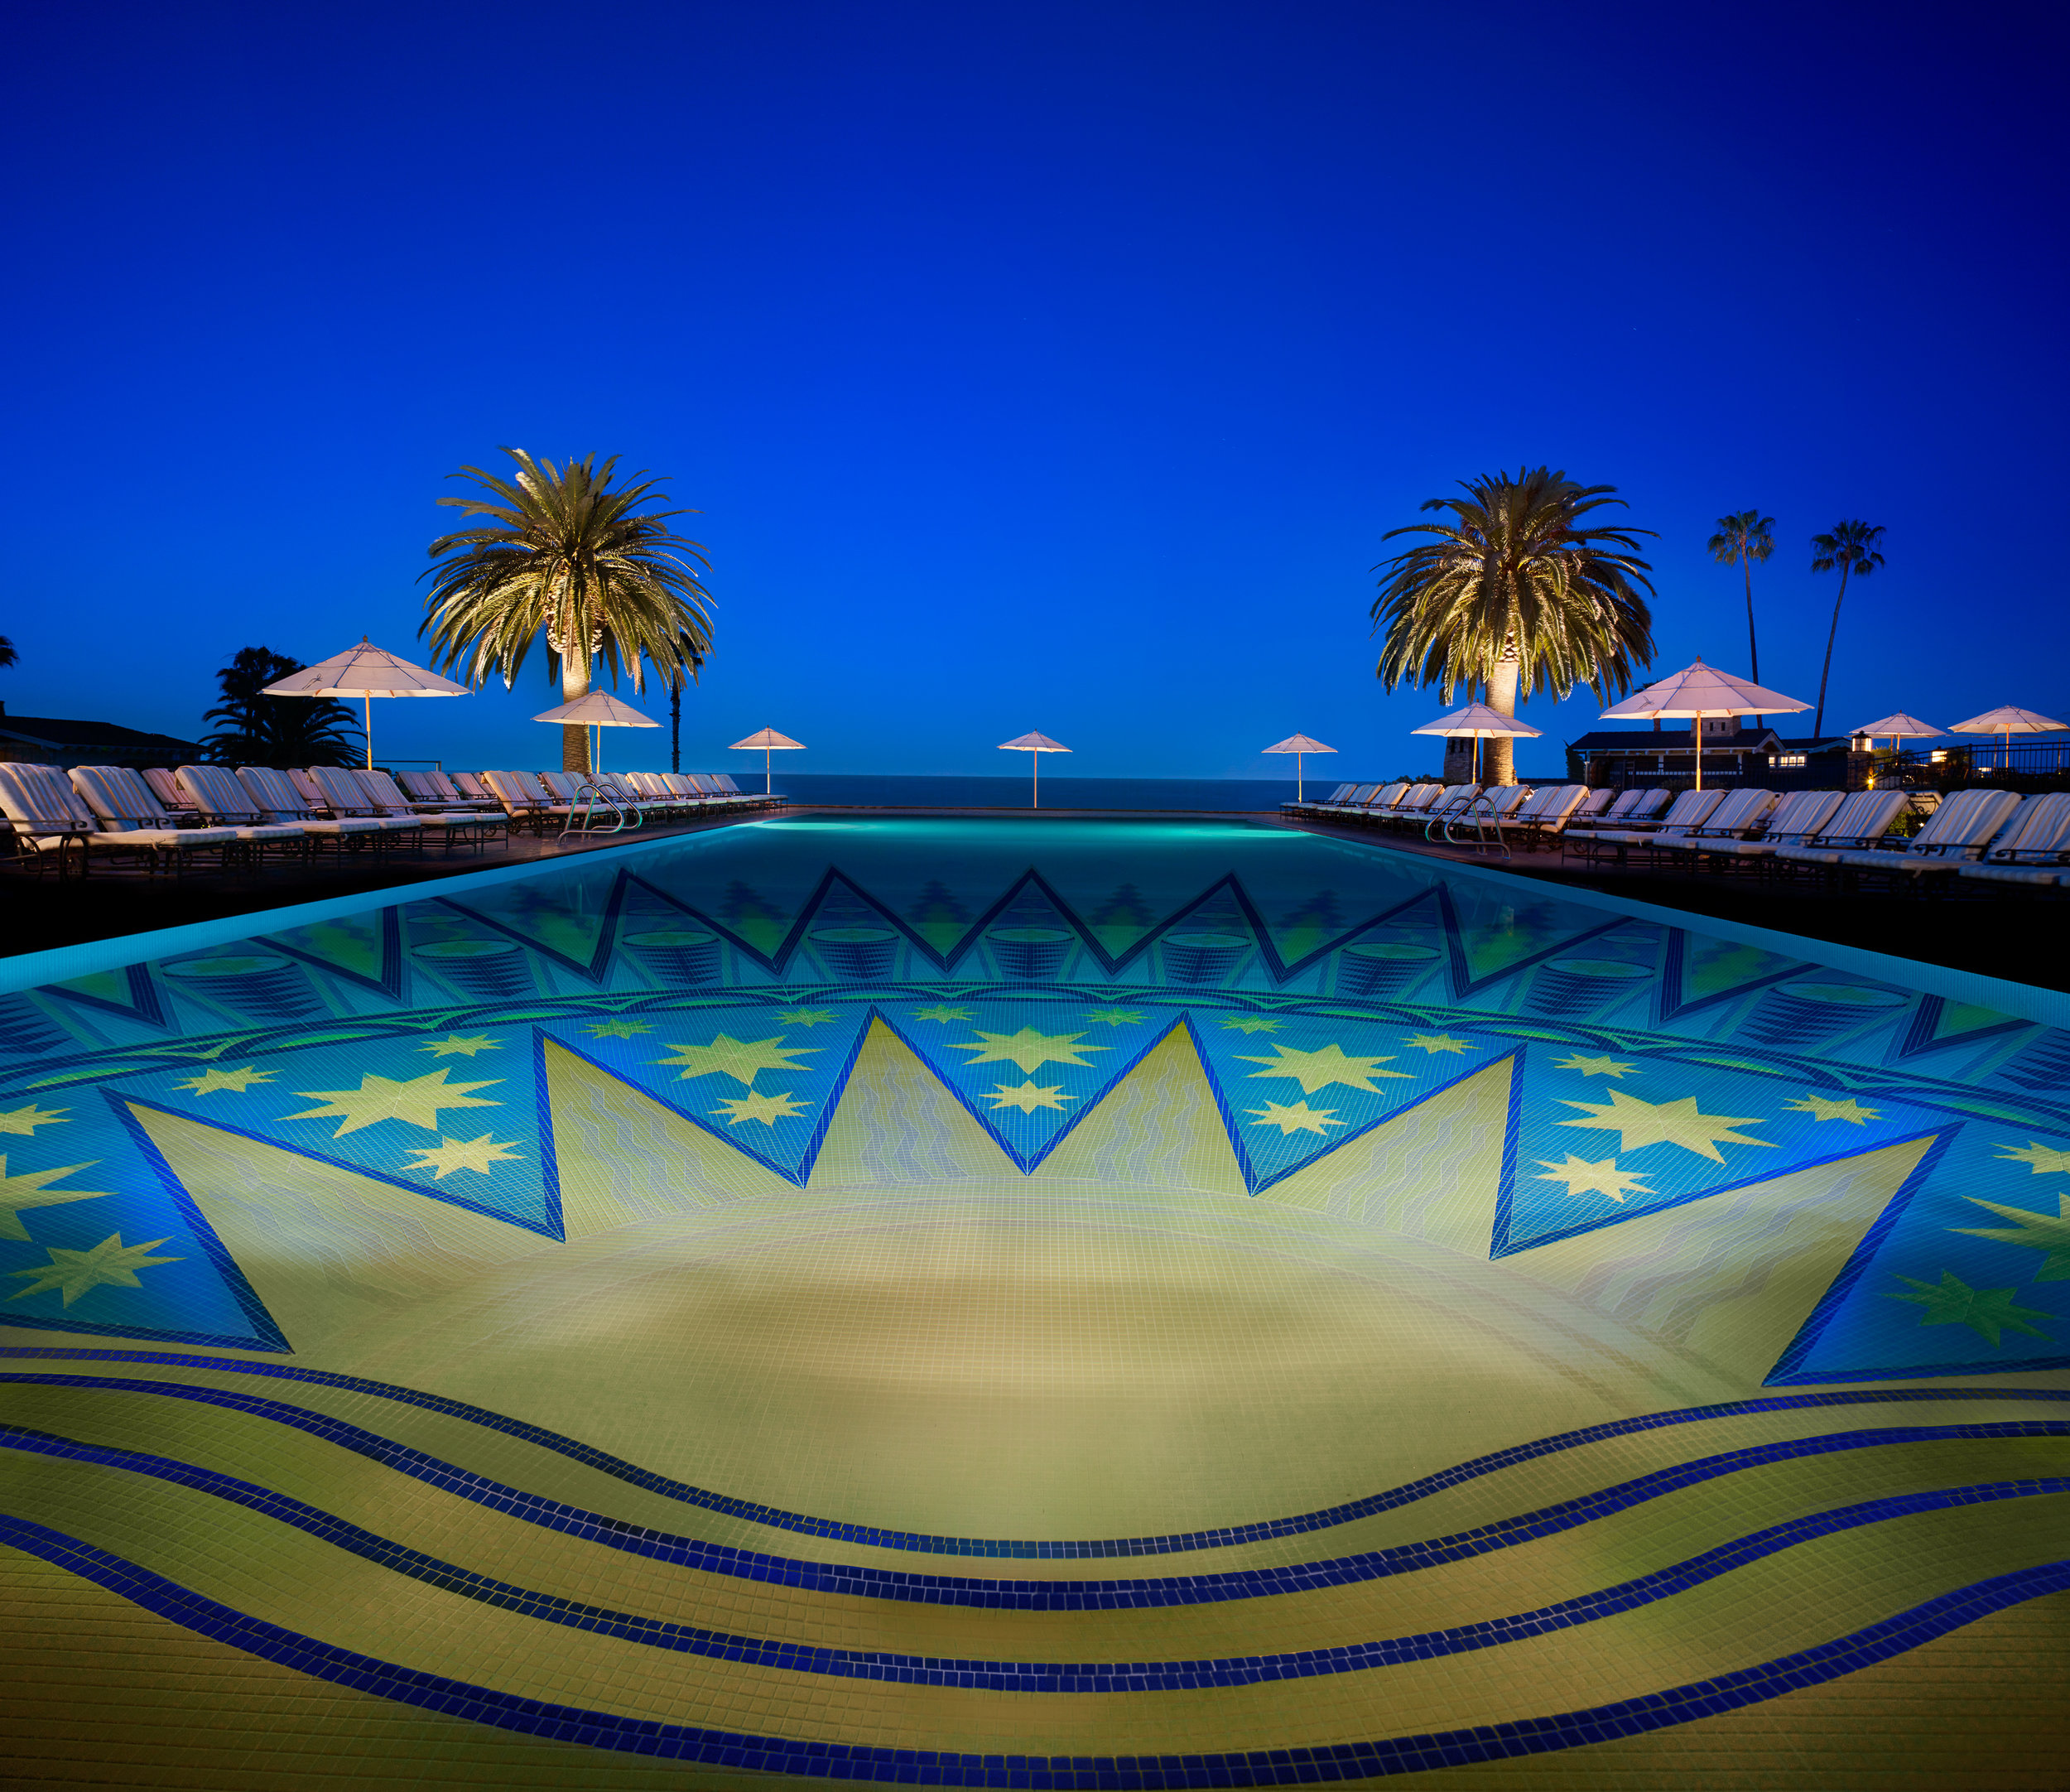 MLB-Architectural-Mosaic Pool-Evening Closeup.jpg